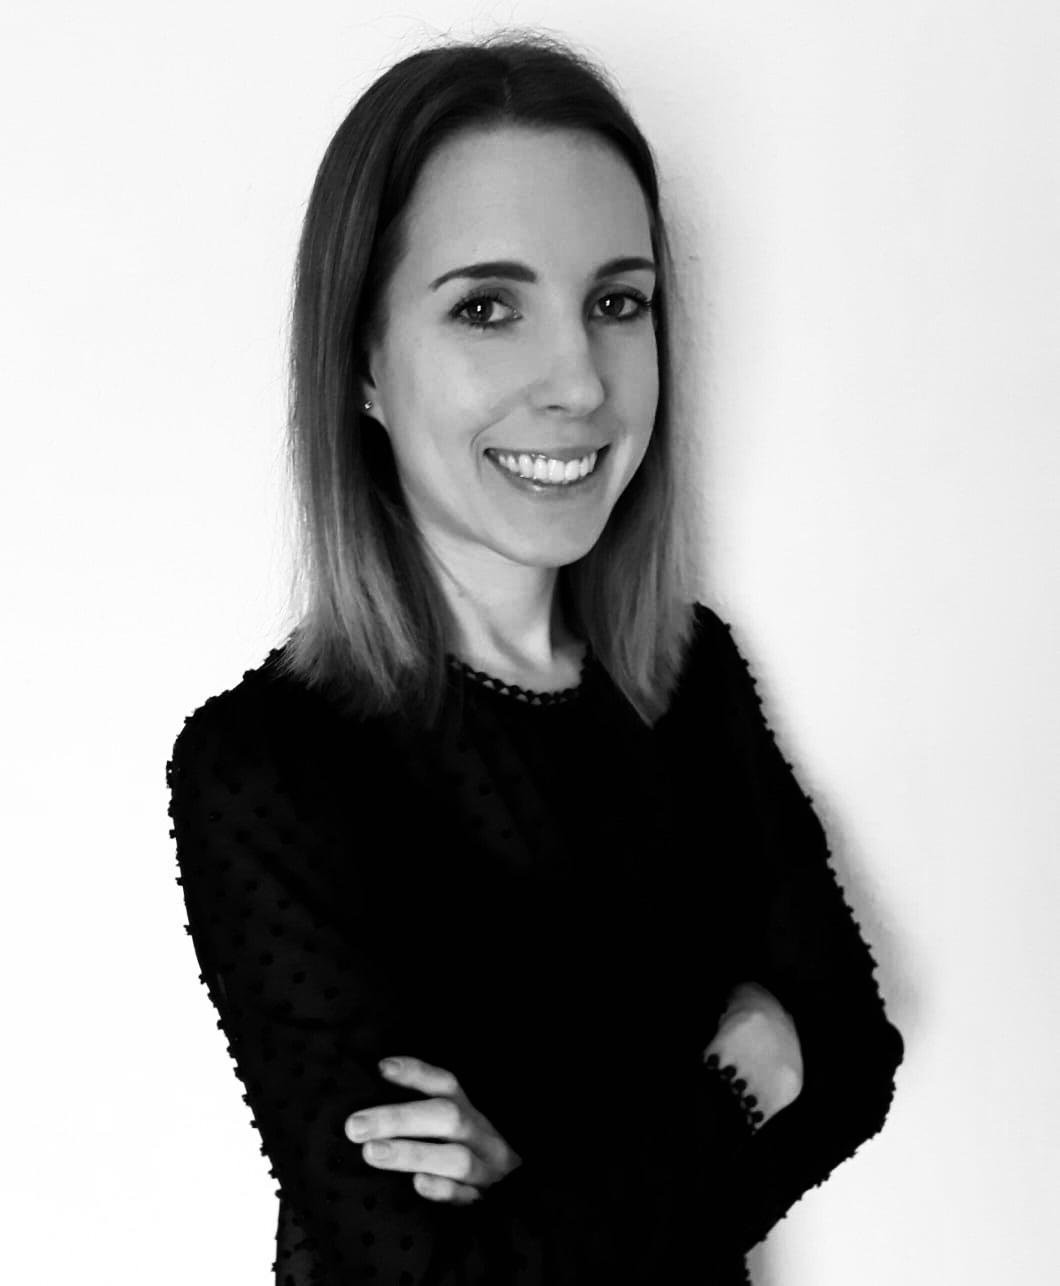 Portrait of Theresa Richter